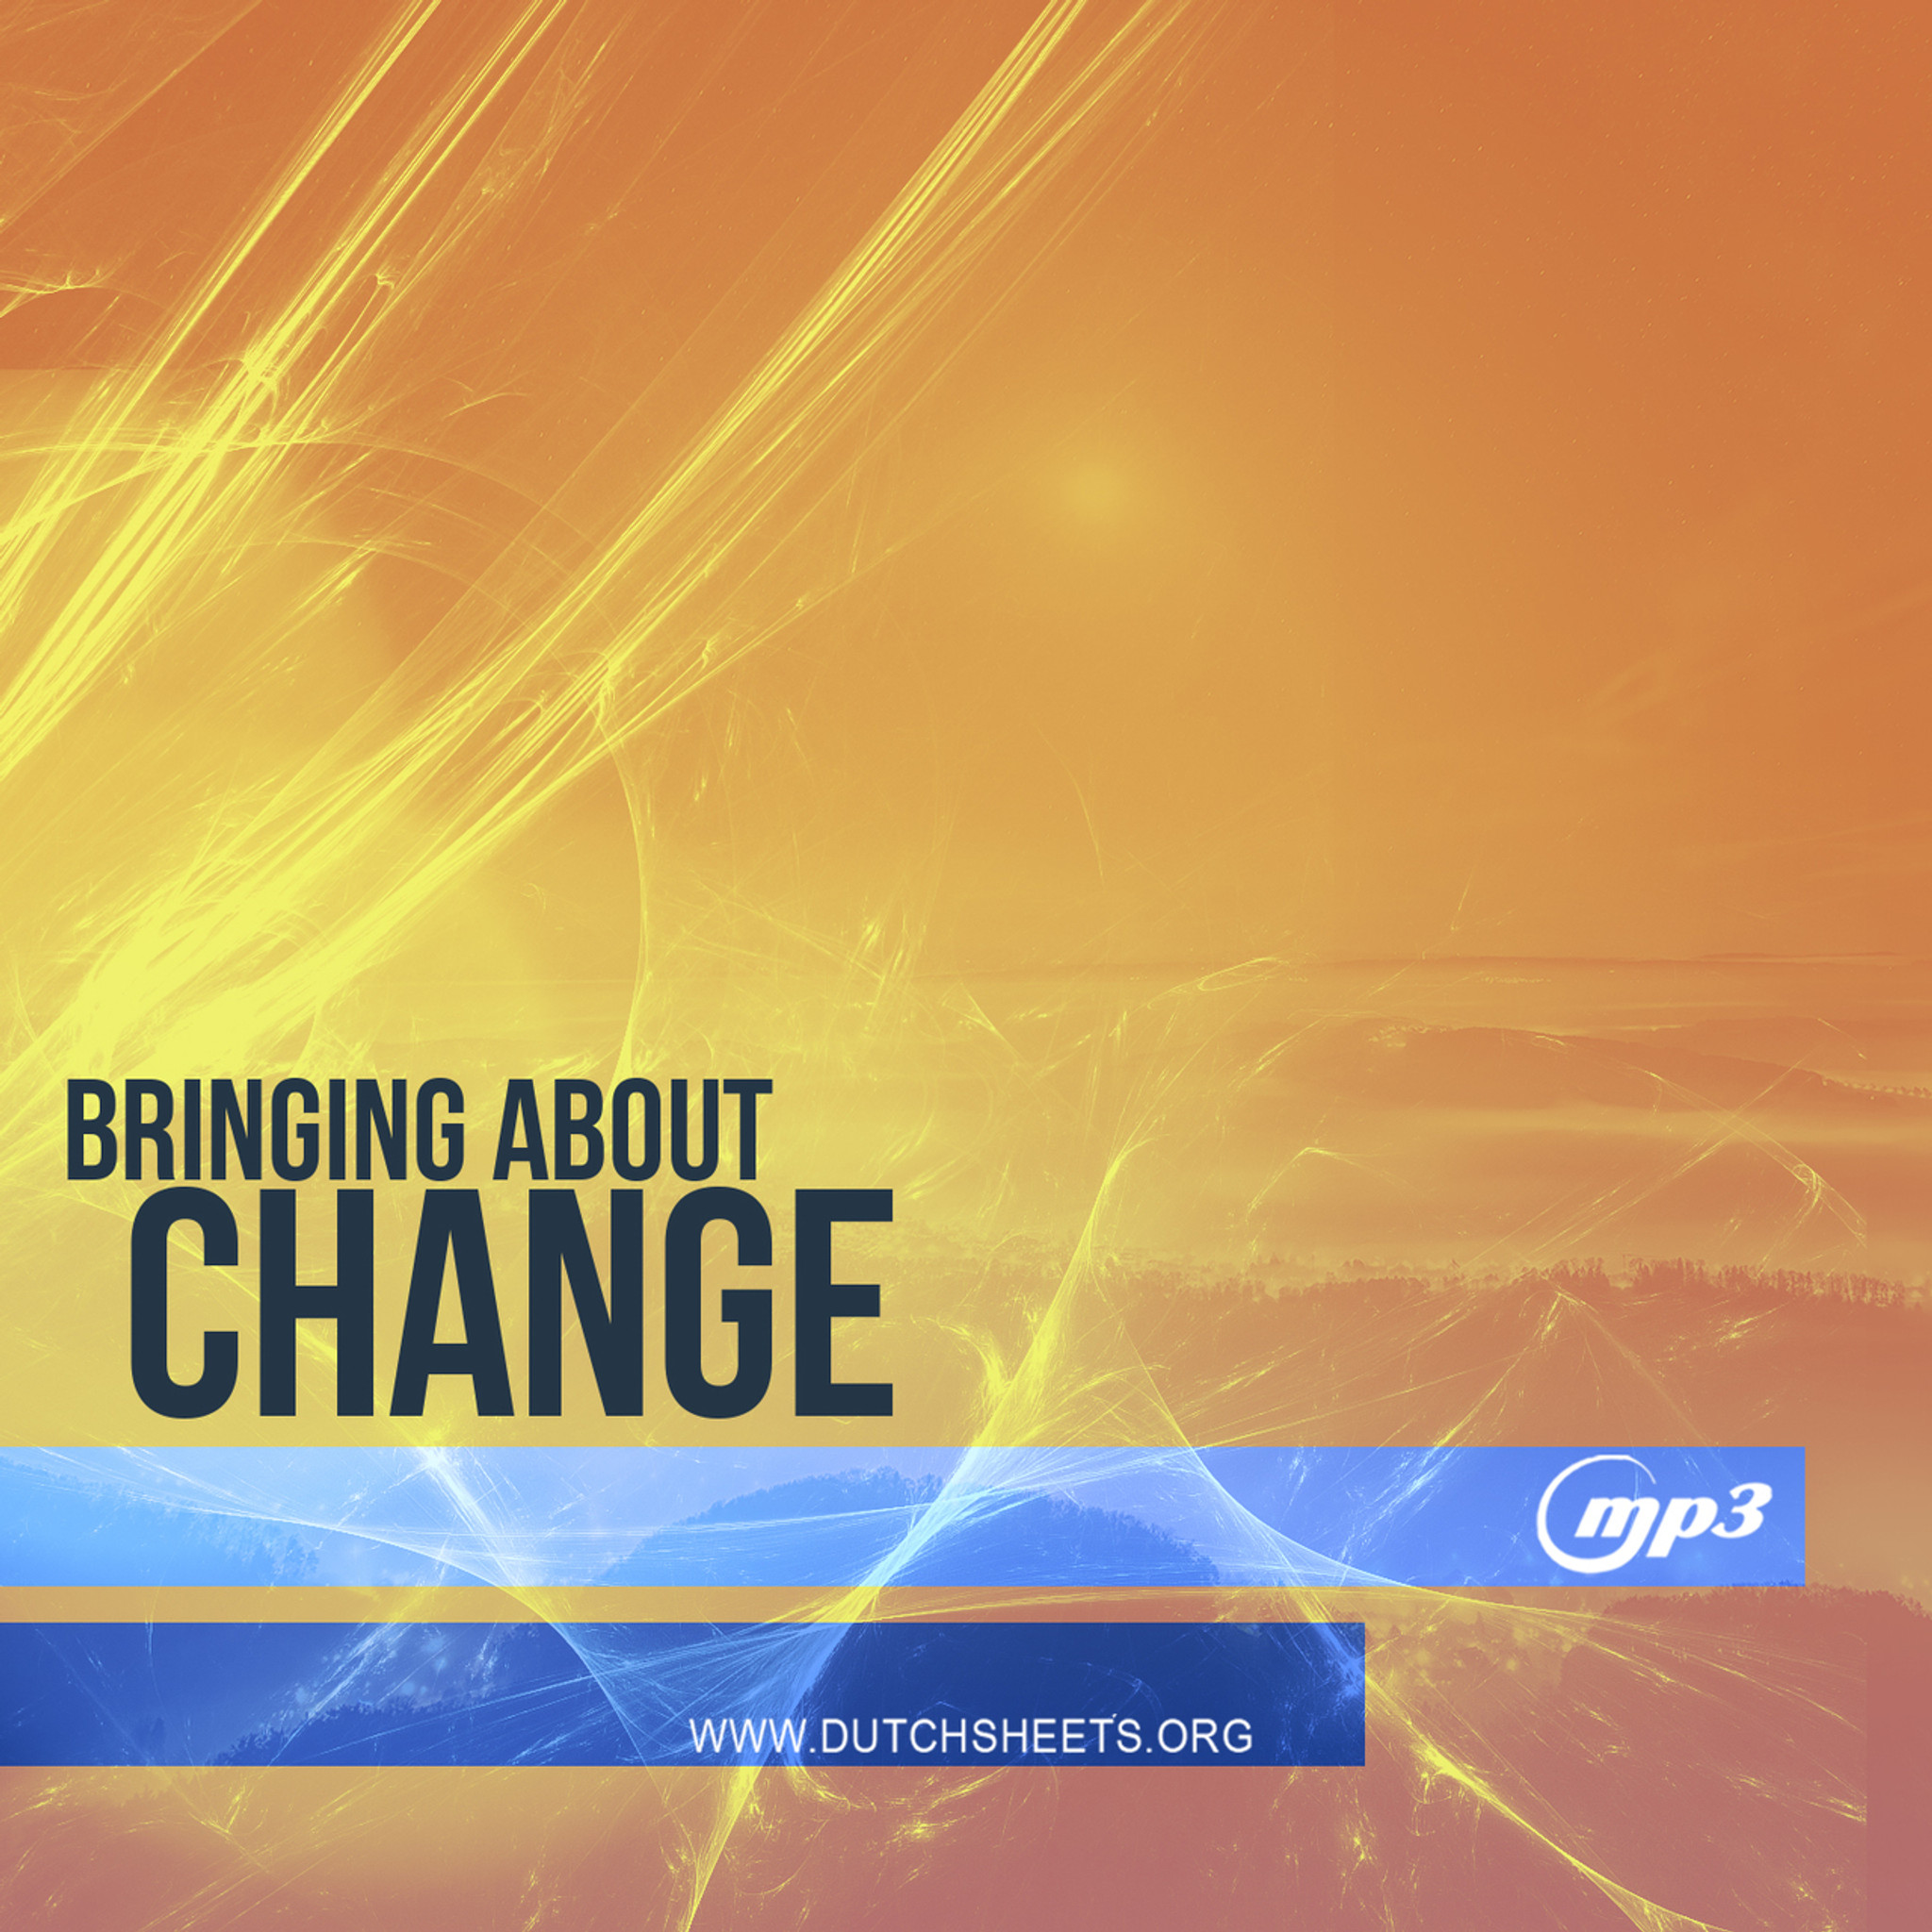 change mp3 download